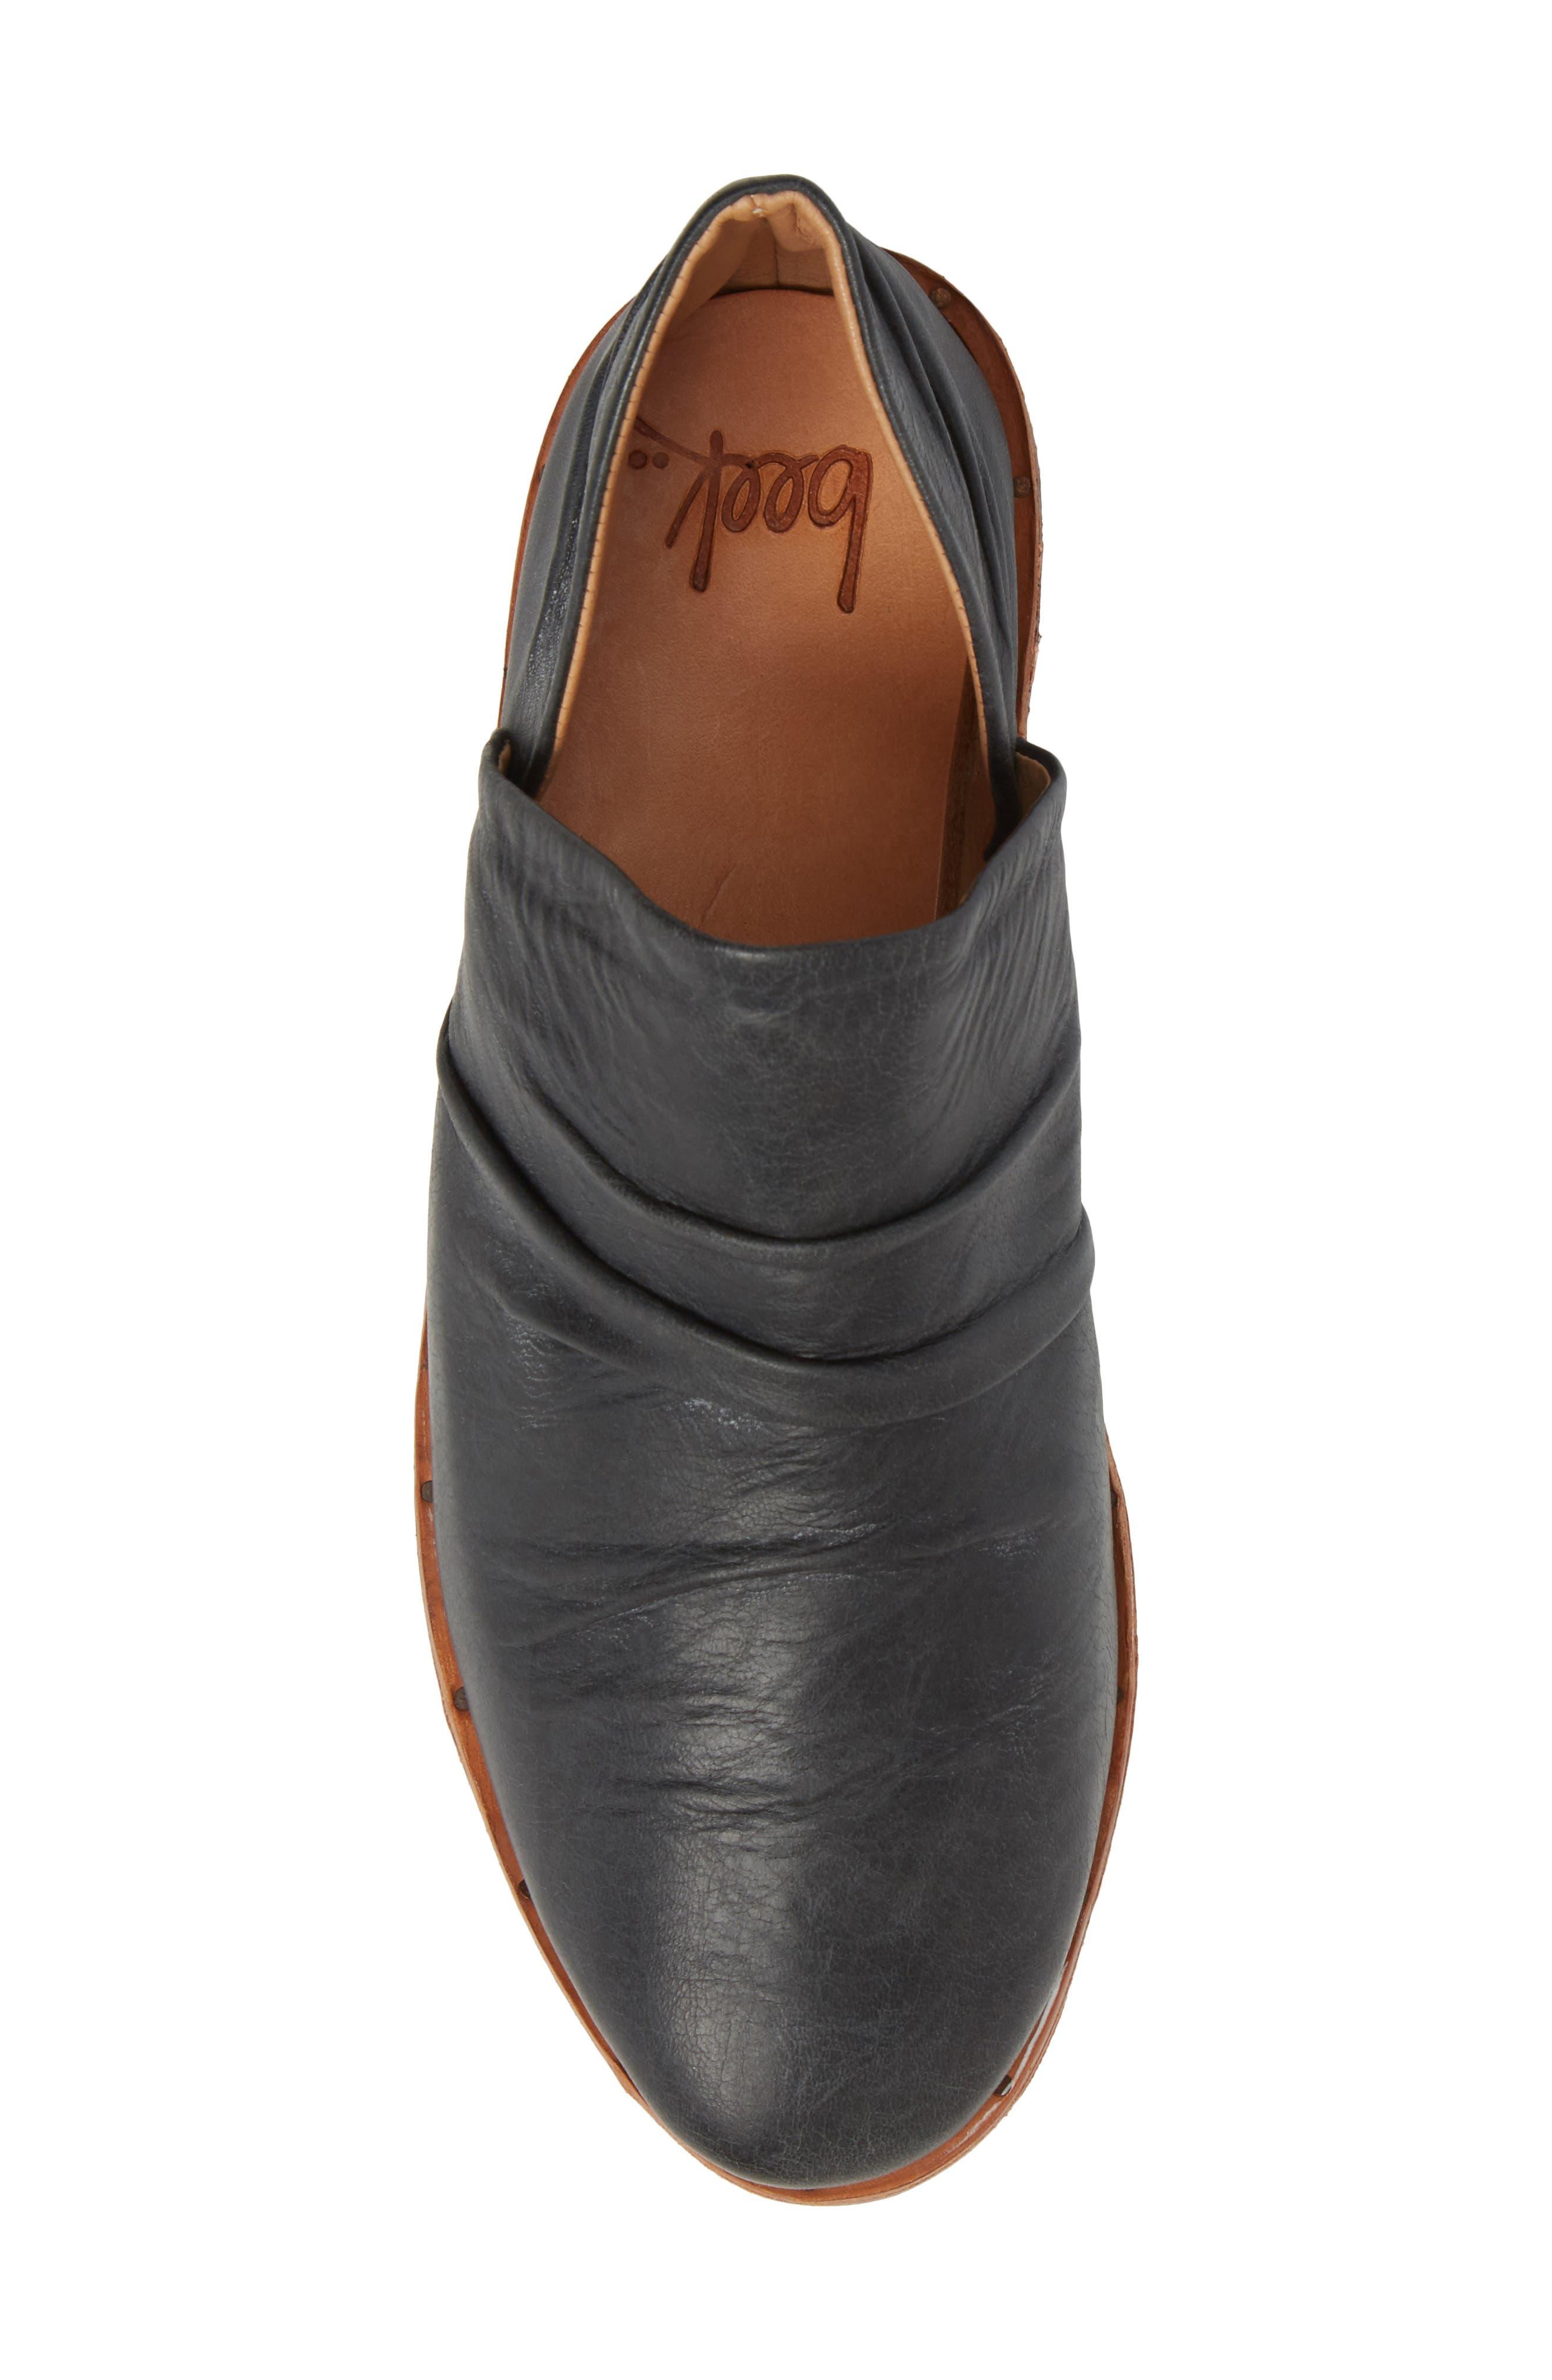 Puffin Loafer,                             Alternate thumbnail 5, color,                             Vintage Black